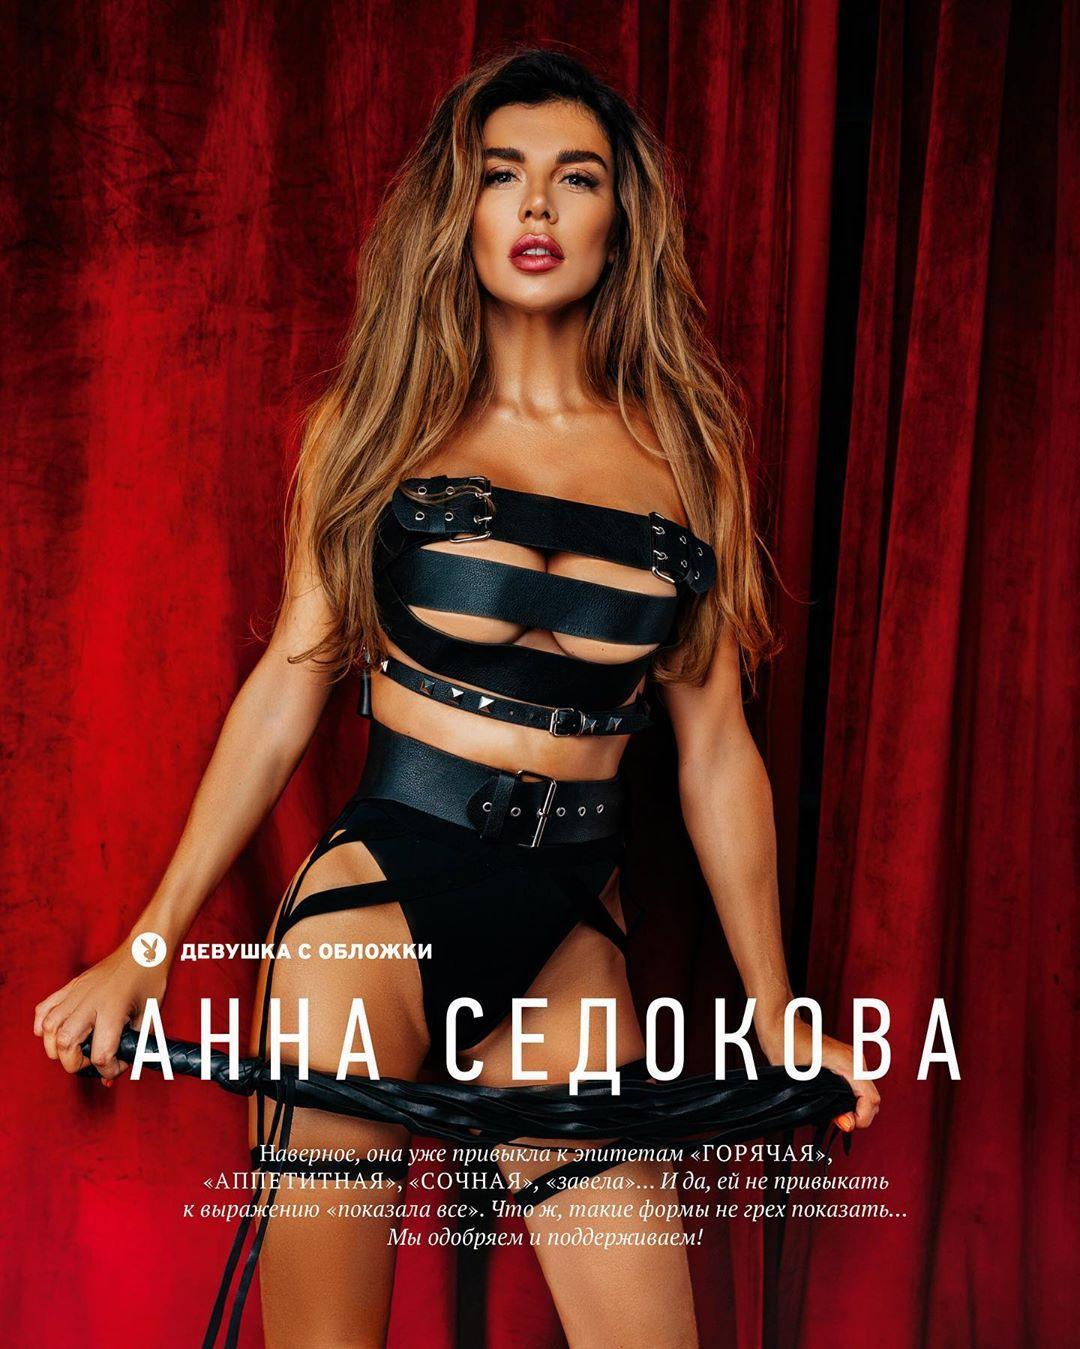 Анна Седокова без трусов загнулась для Playboy, фото